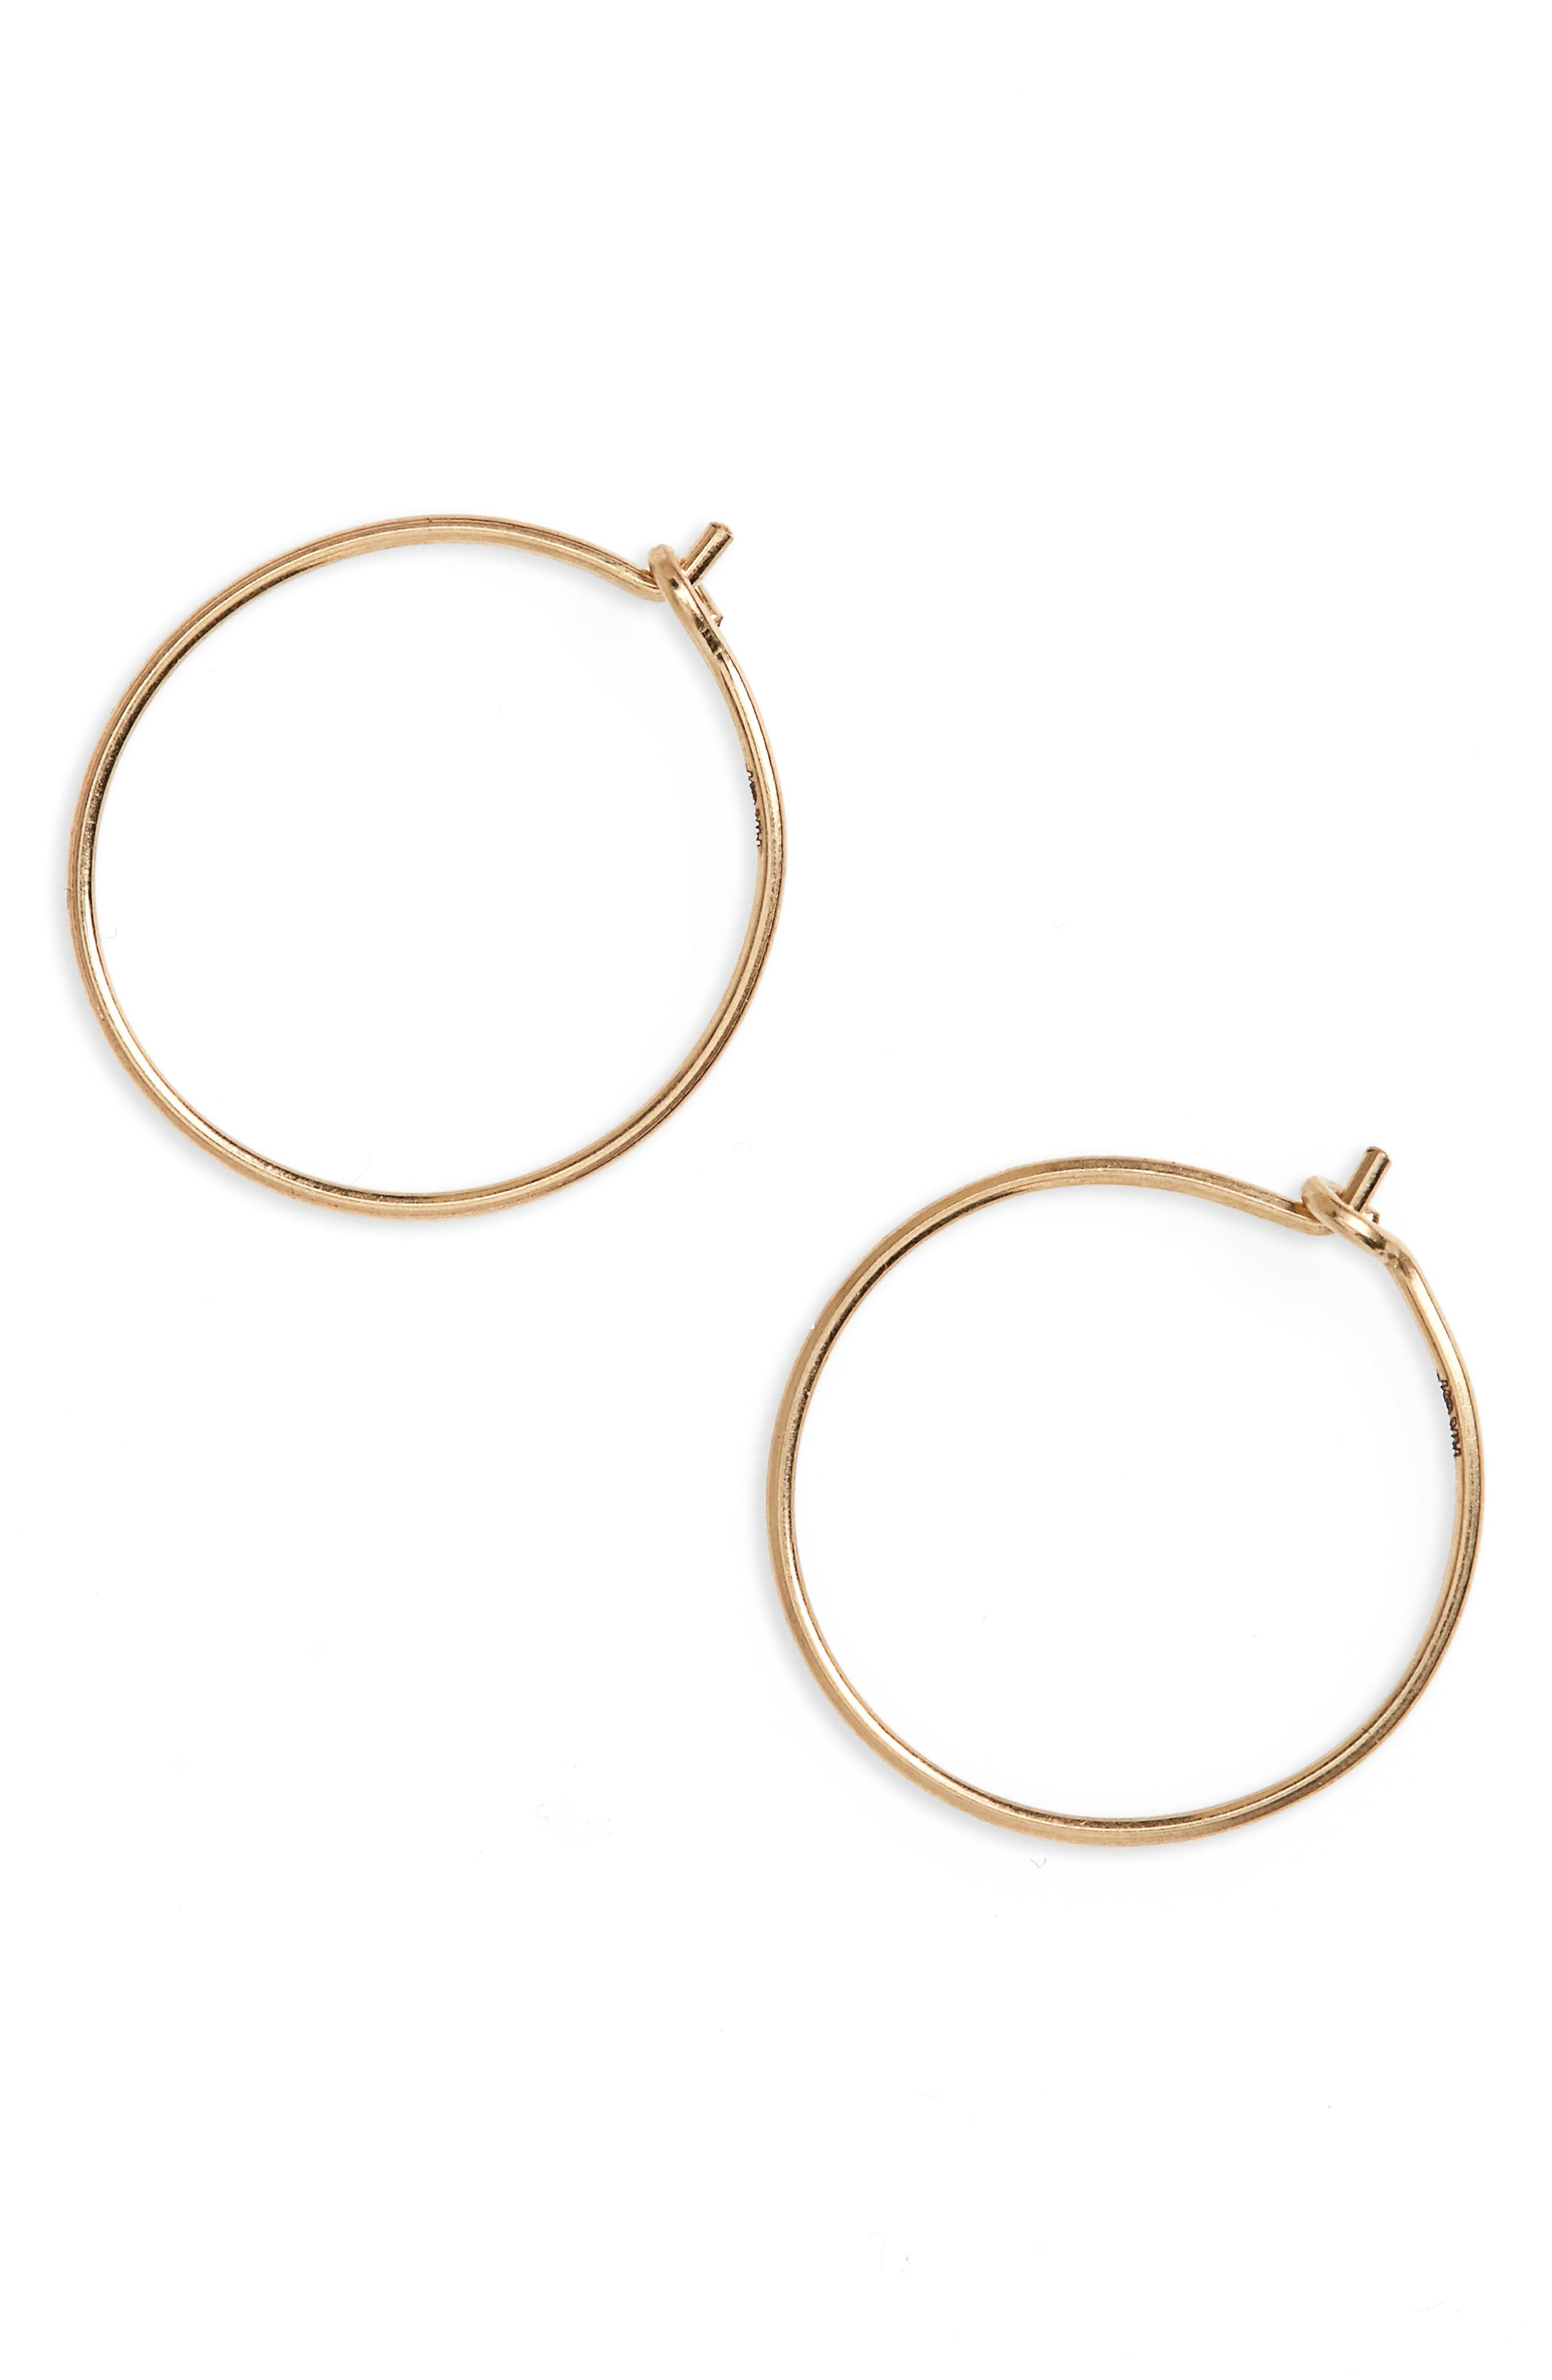 Delicate Wire Hoop Earrings,                             Main thumbnail 1, color,                             710